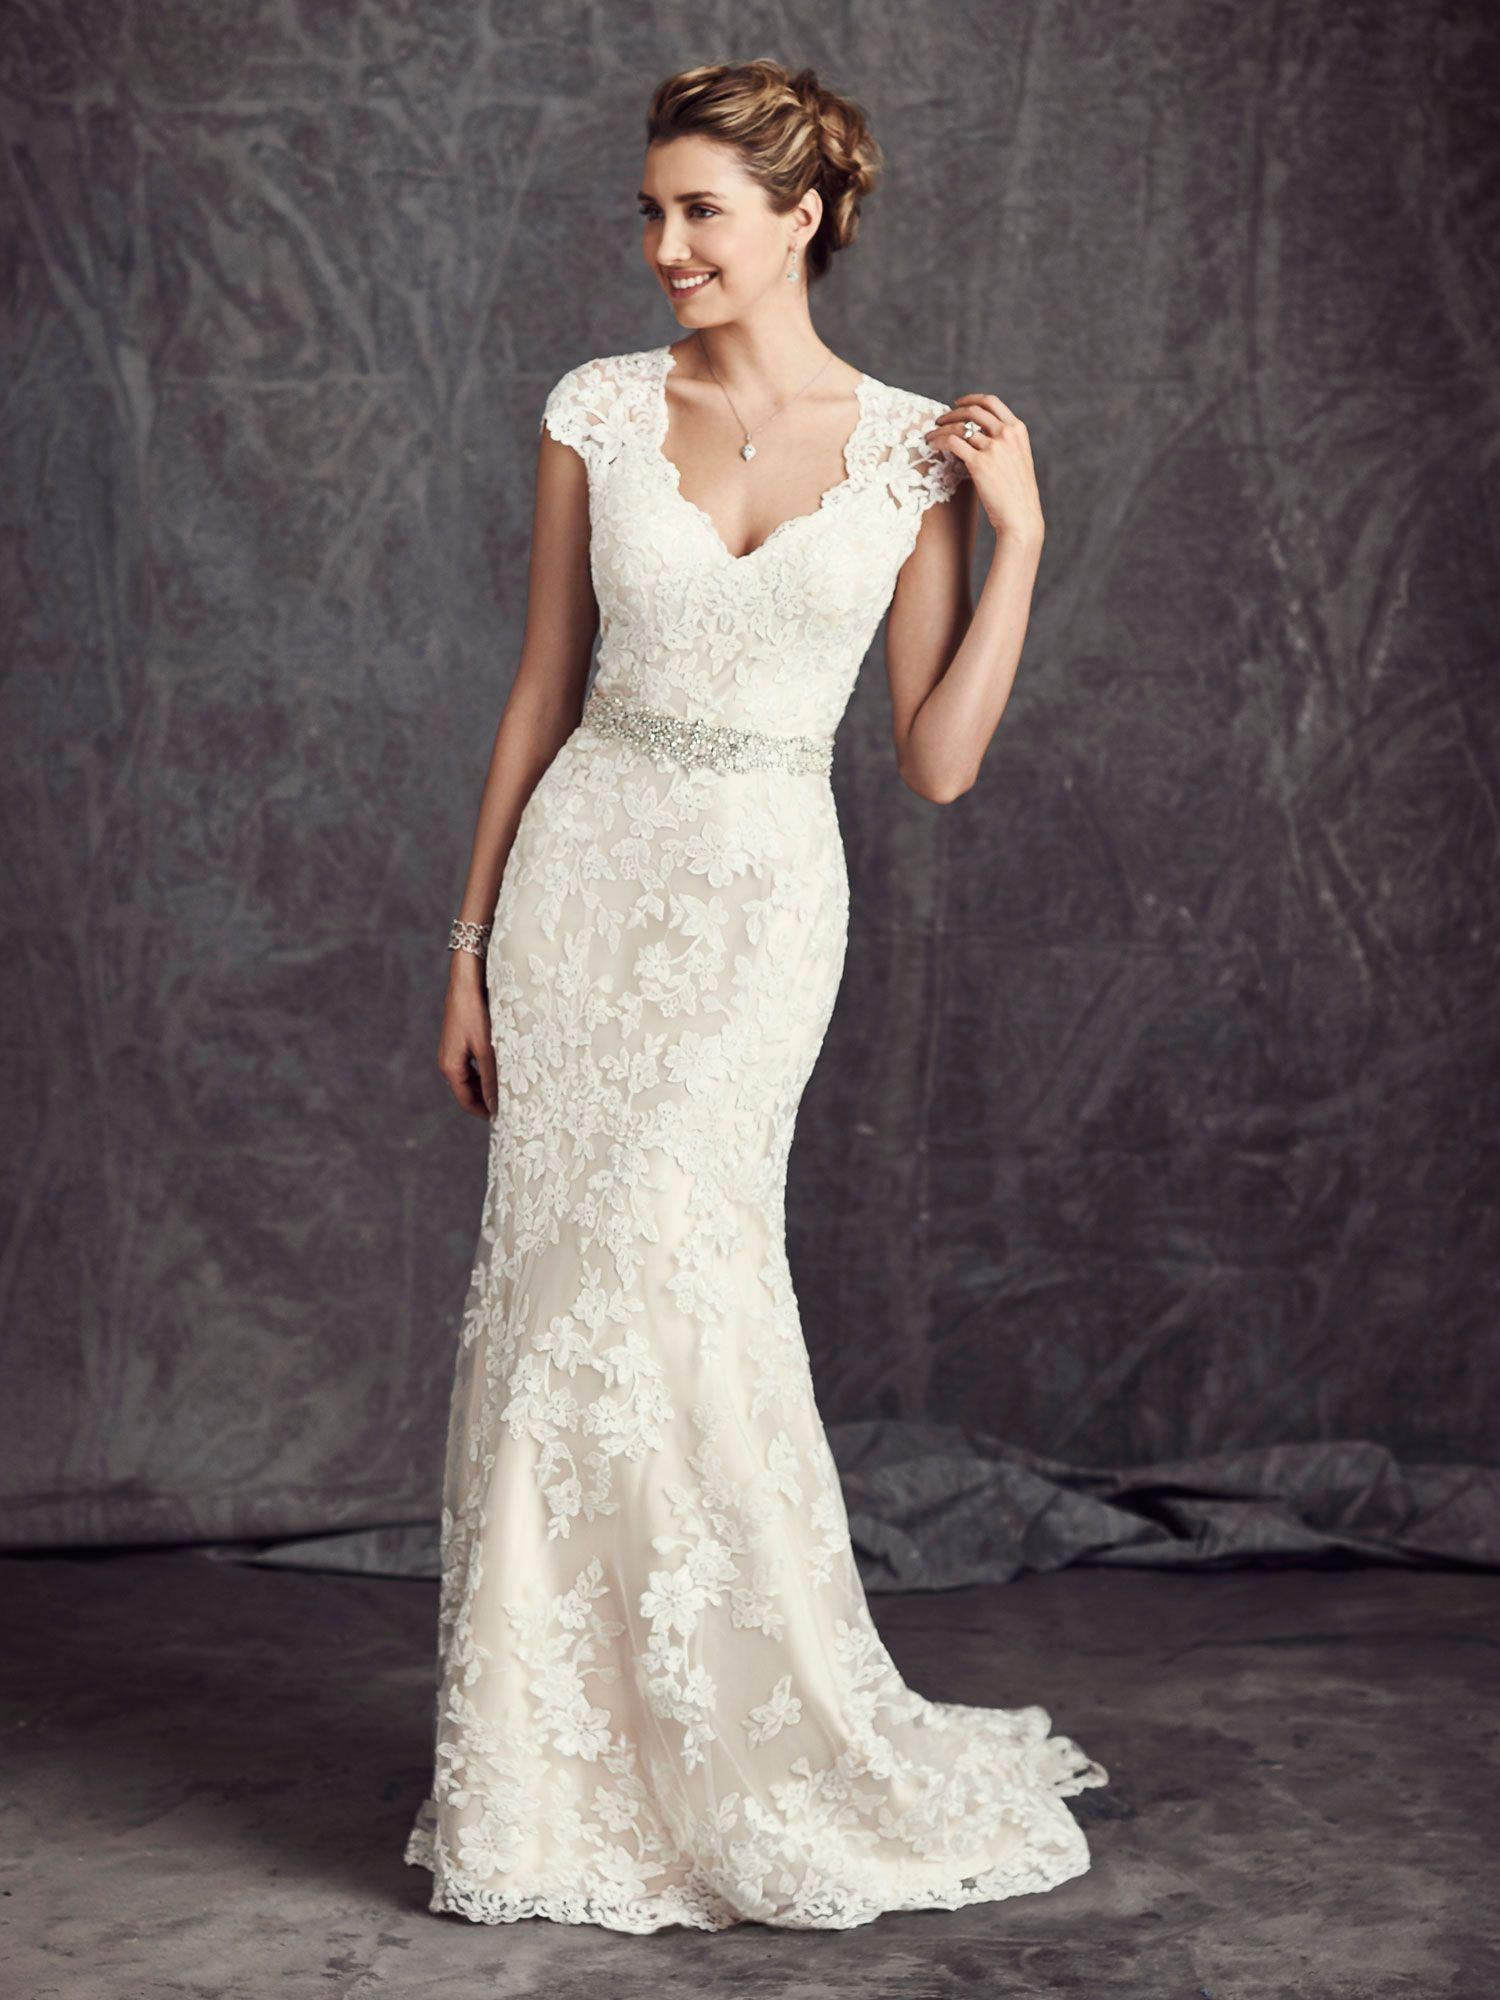 Ella Rosa Be277 Short Sleeve Wedding Dress Wedding Dresses Sheath Wedding Dress Lace [ 2000 x 1500 Pixel ]